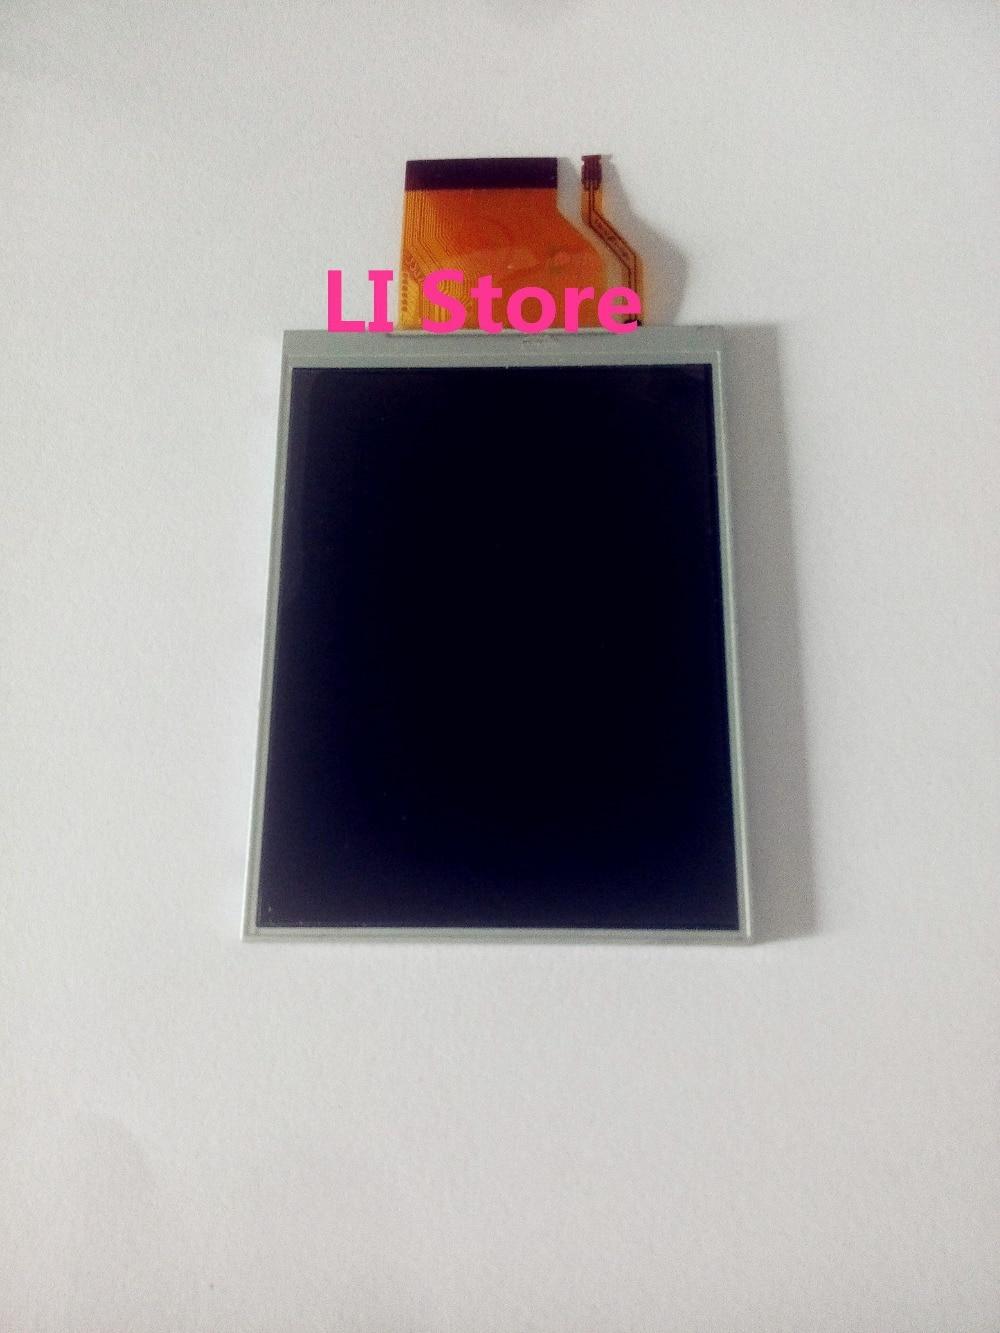 NEW LCD Display Screen Repair Part For NIKON D5100 Digital Camera WITH Backlight